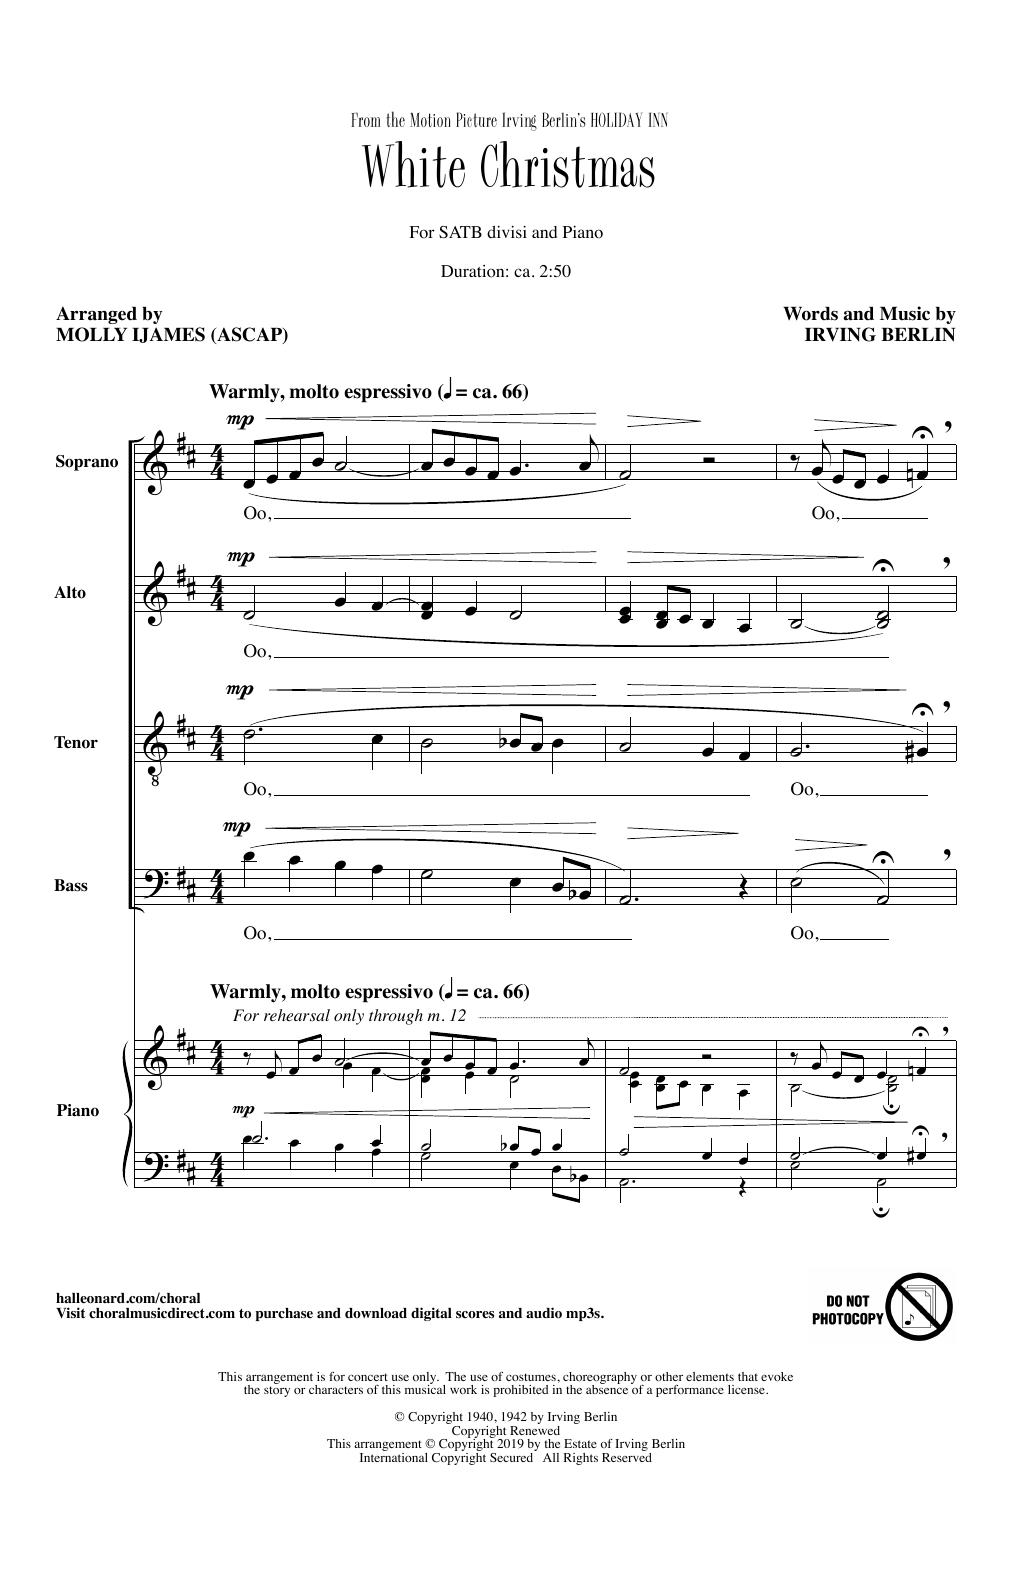 White Christmas Piano Sheet Music.Irving Berlin White Christmas From Holiday Inn Arr Molly Ijames Sheet Music Notes Chords Download Printable Satb Choir Sku 415710